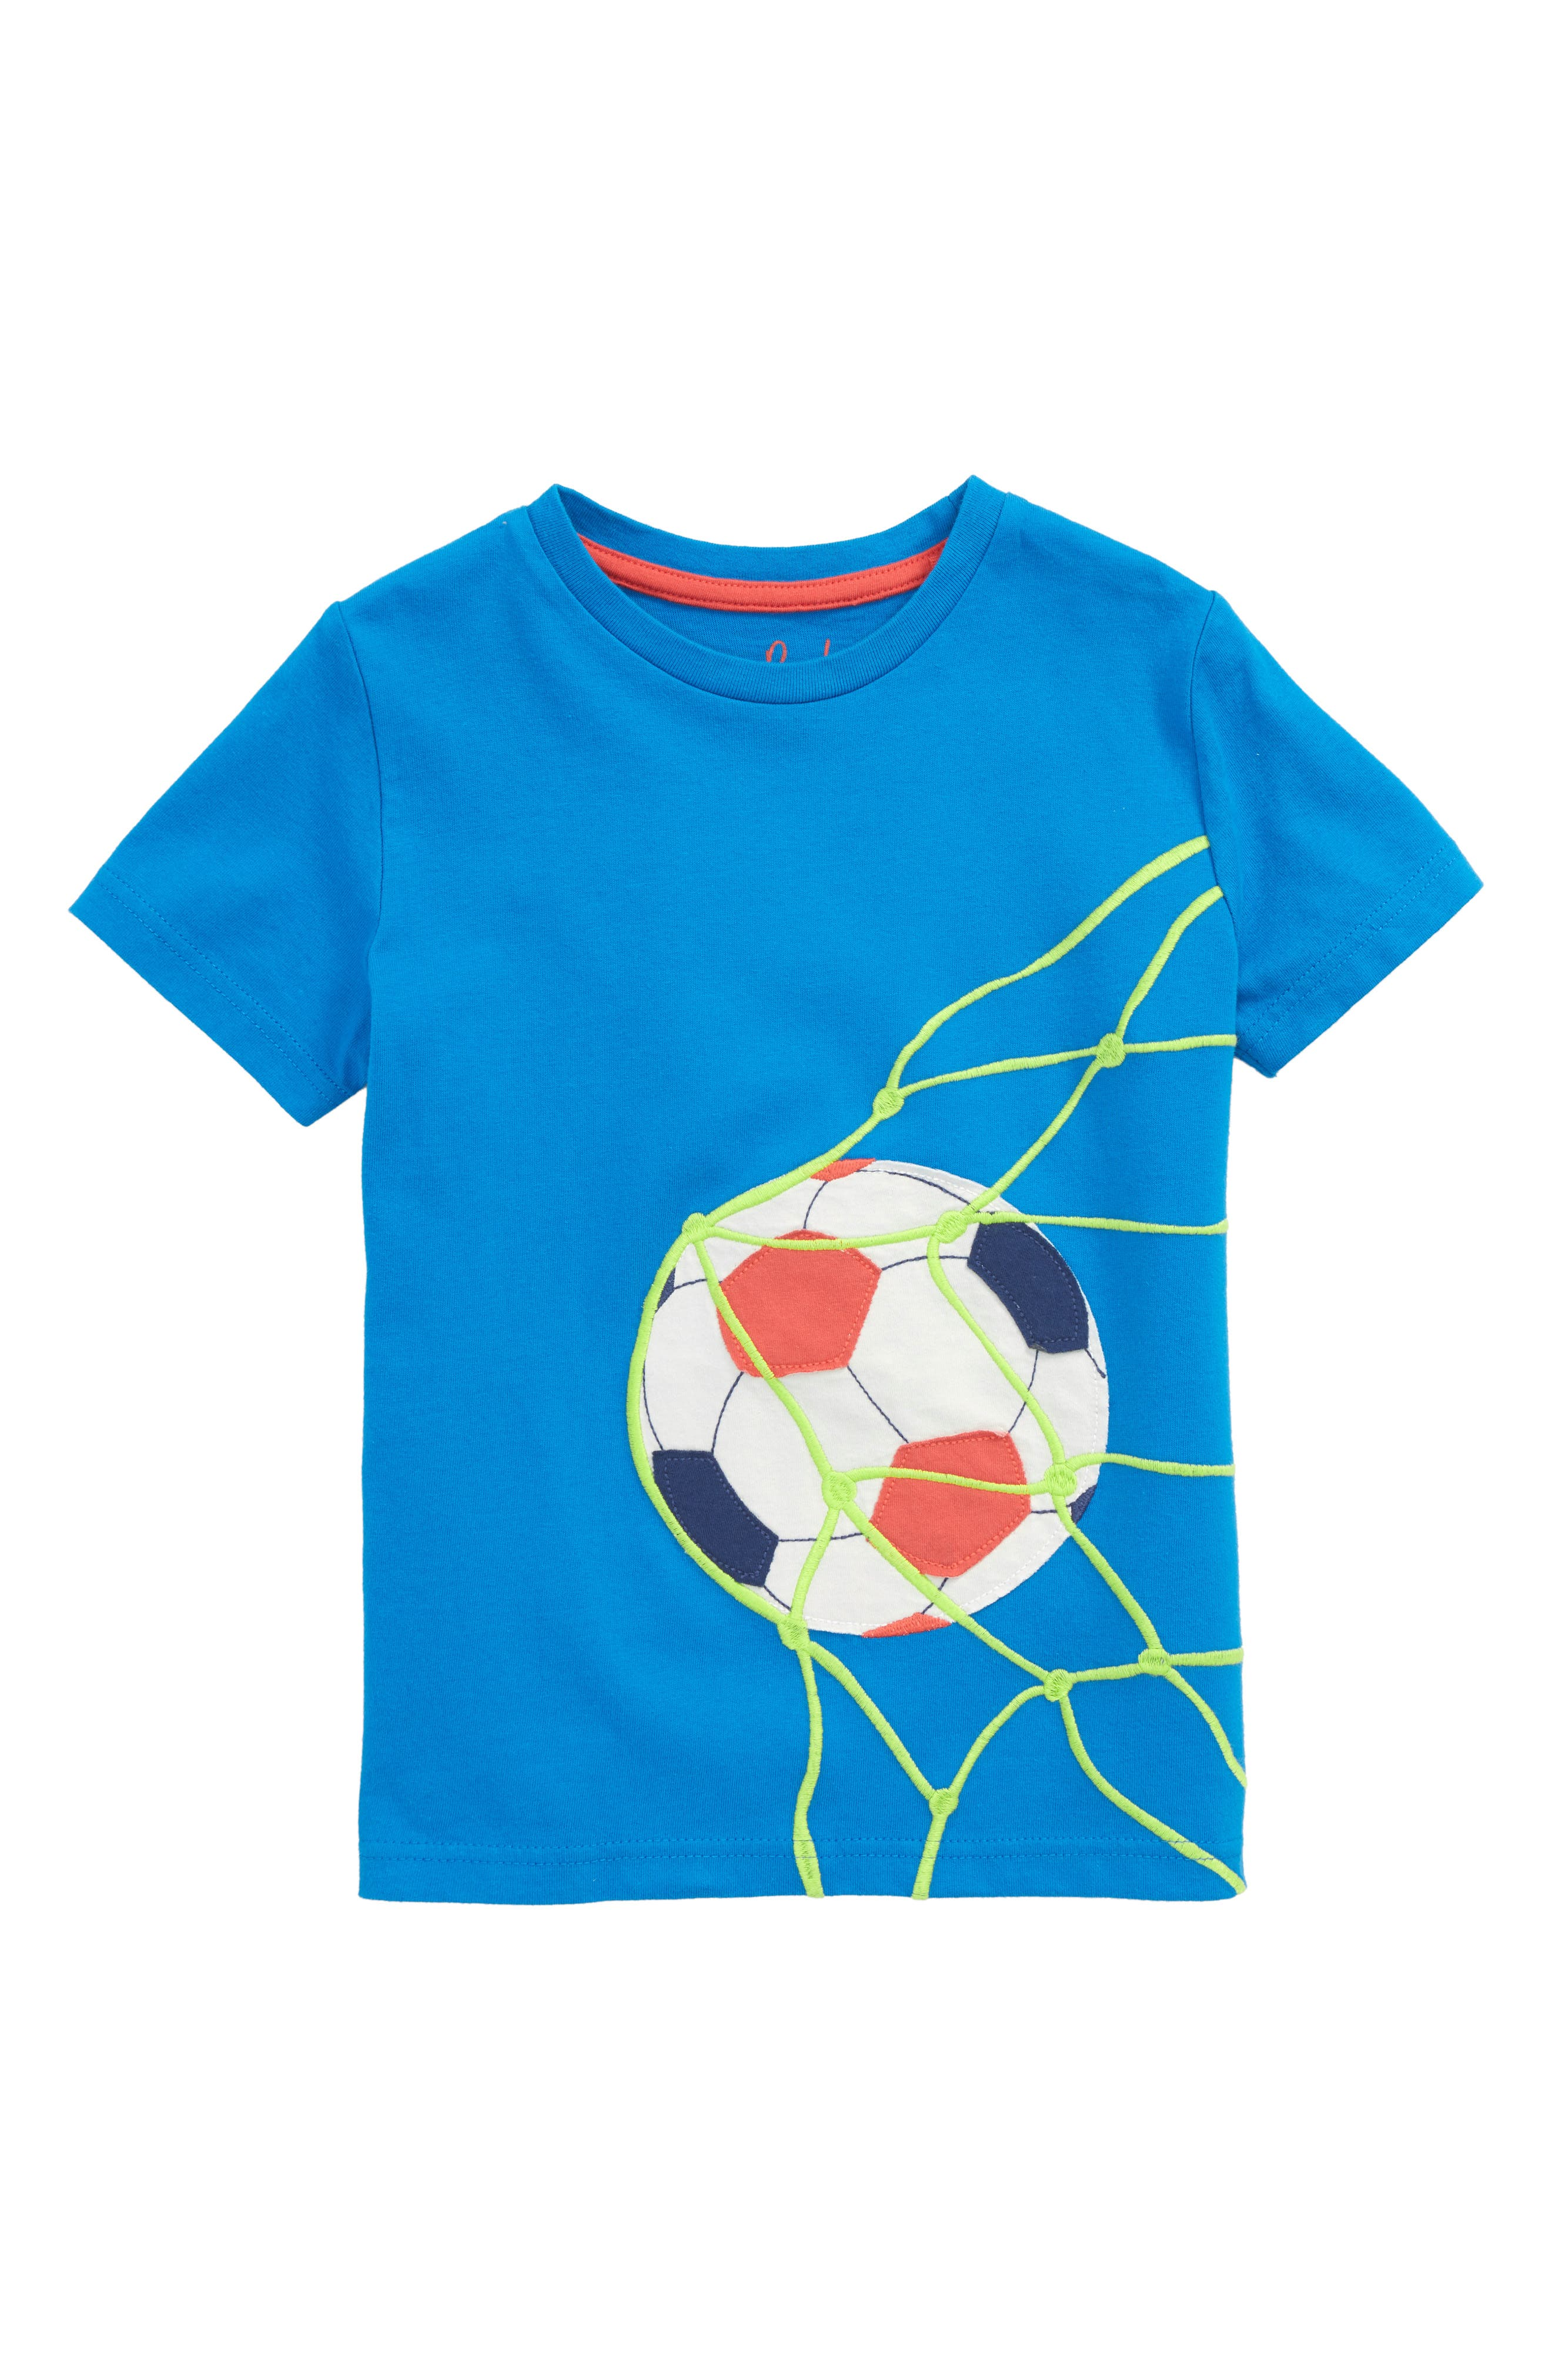 Sports Appliqué T-Shirt,                             Main thumbnail 1, color,                             Yogo Blue Football